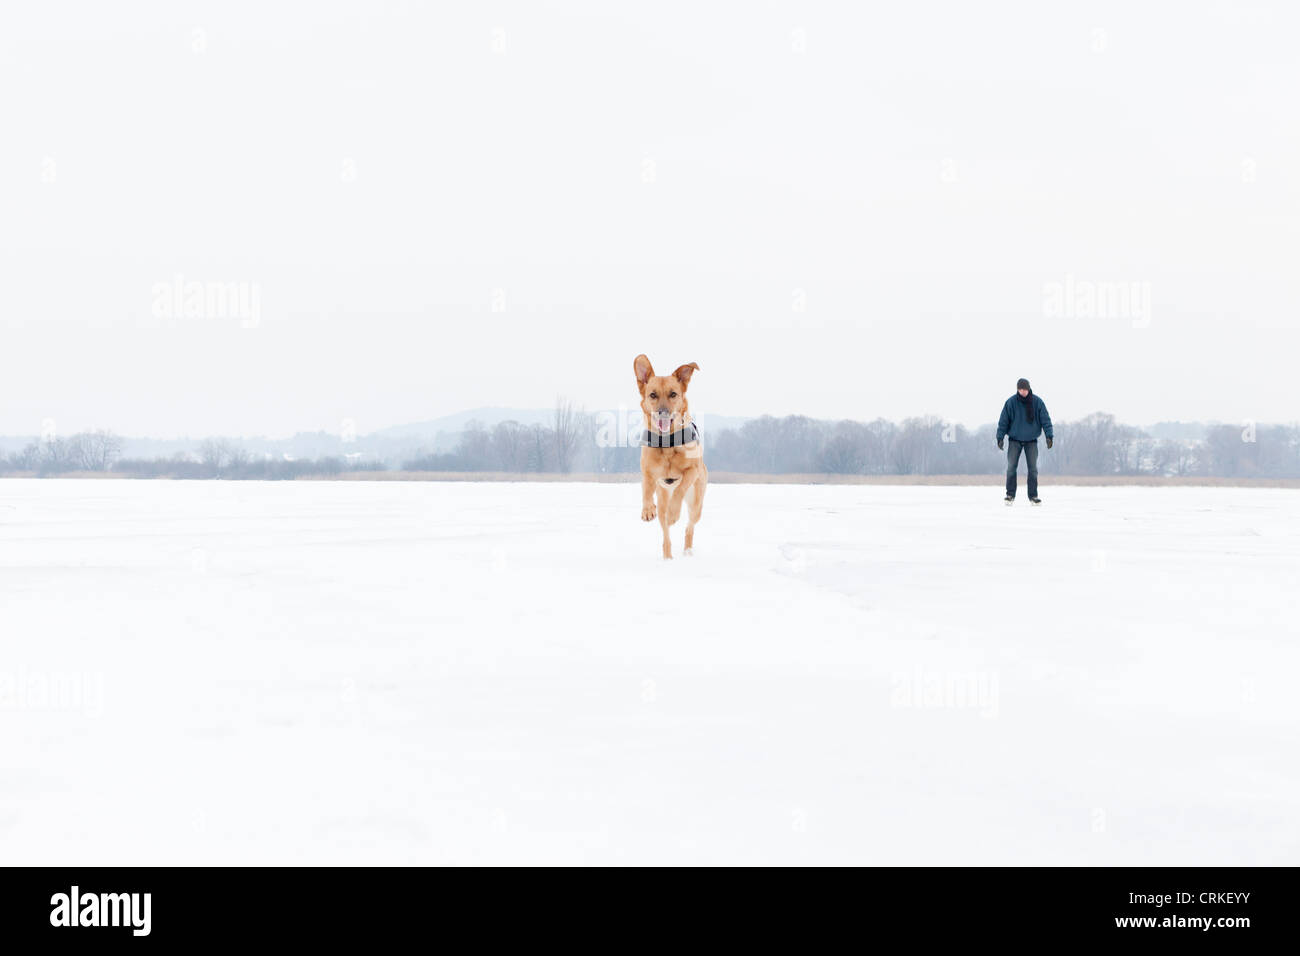 Dog running in snowy field - Stock Image